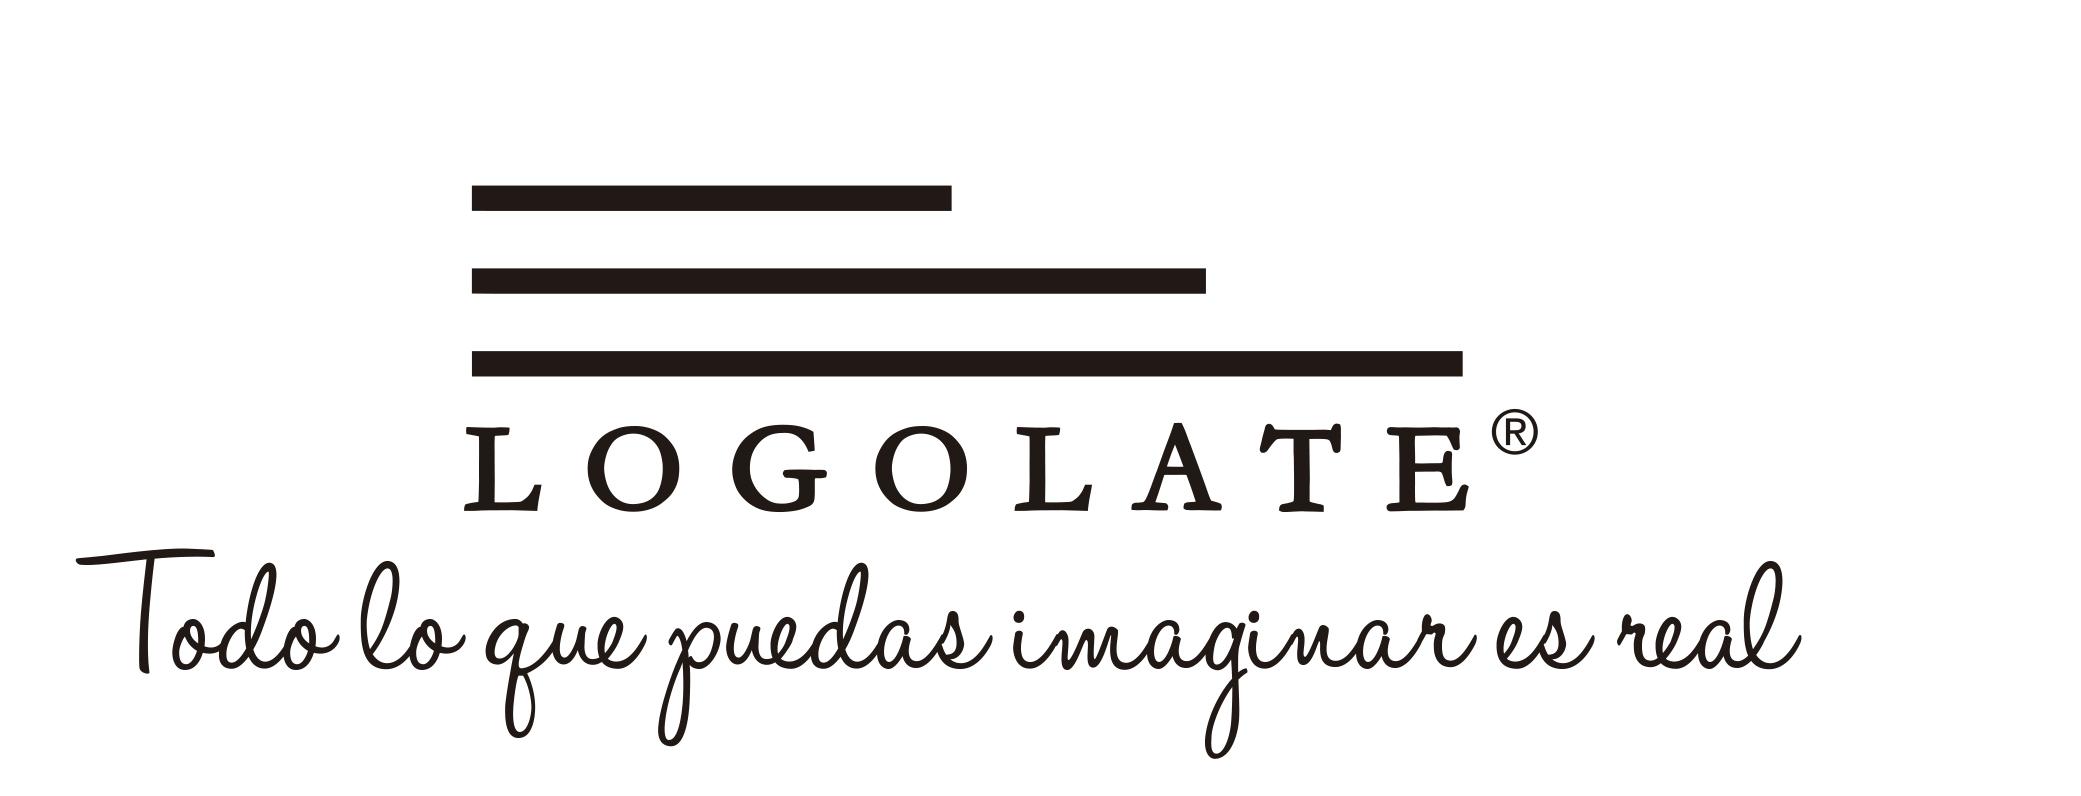 logolate